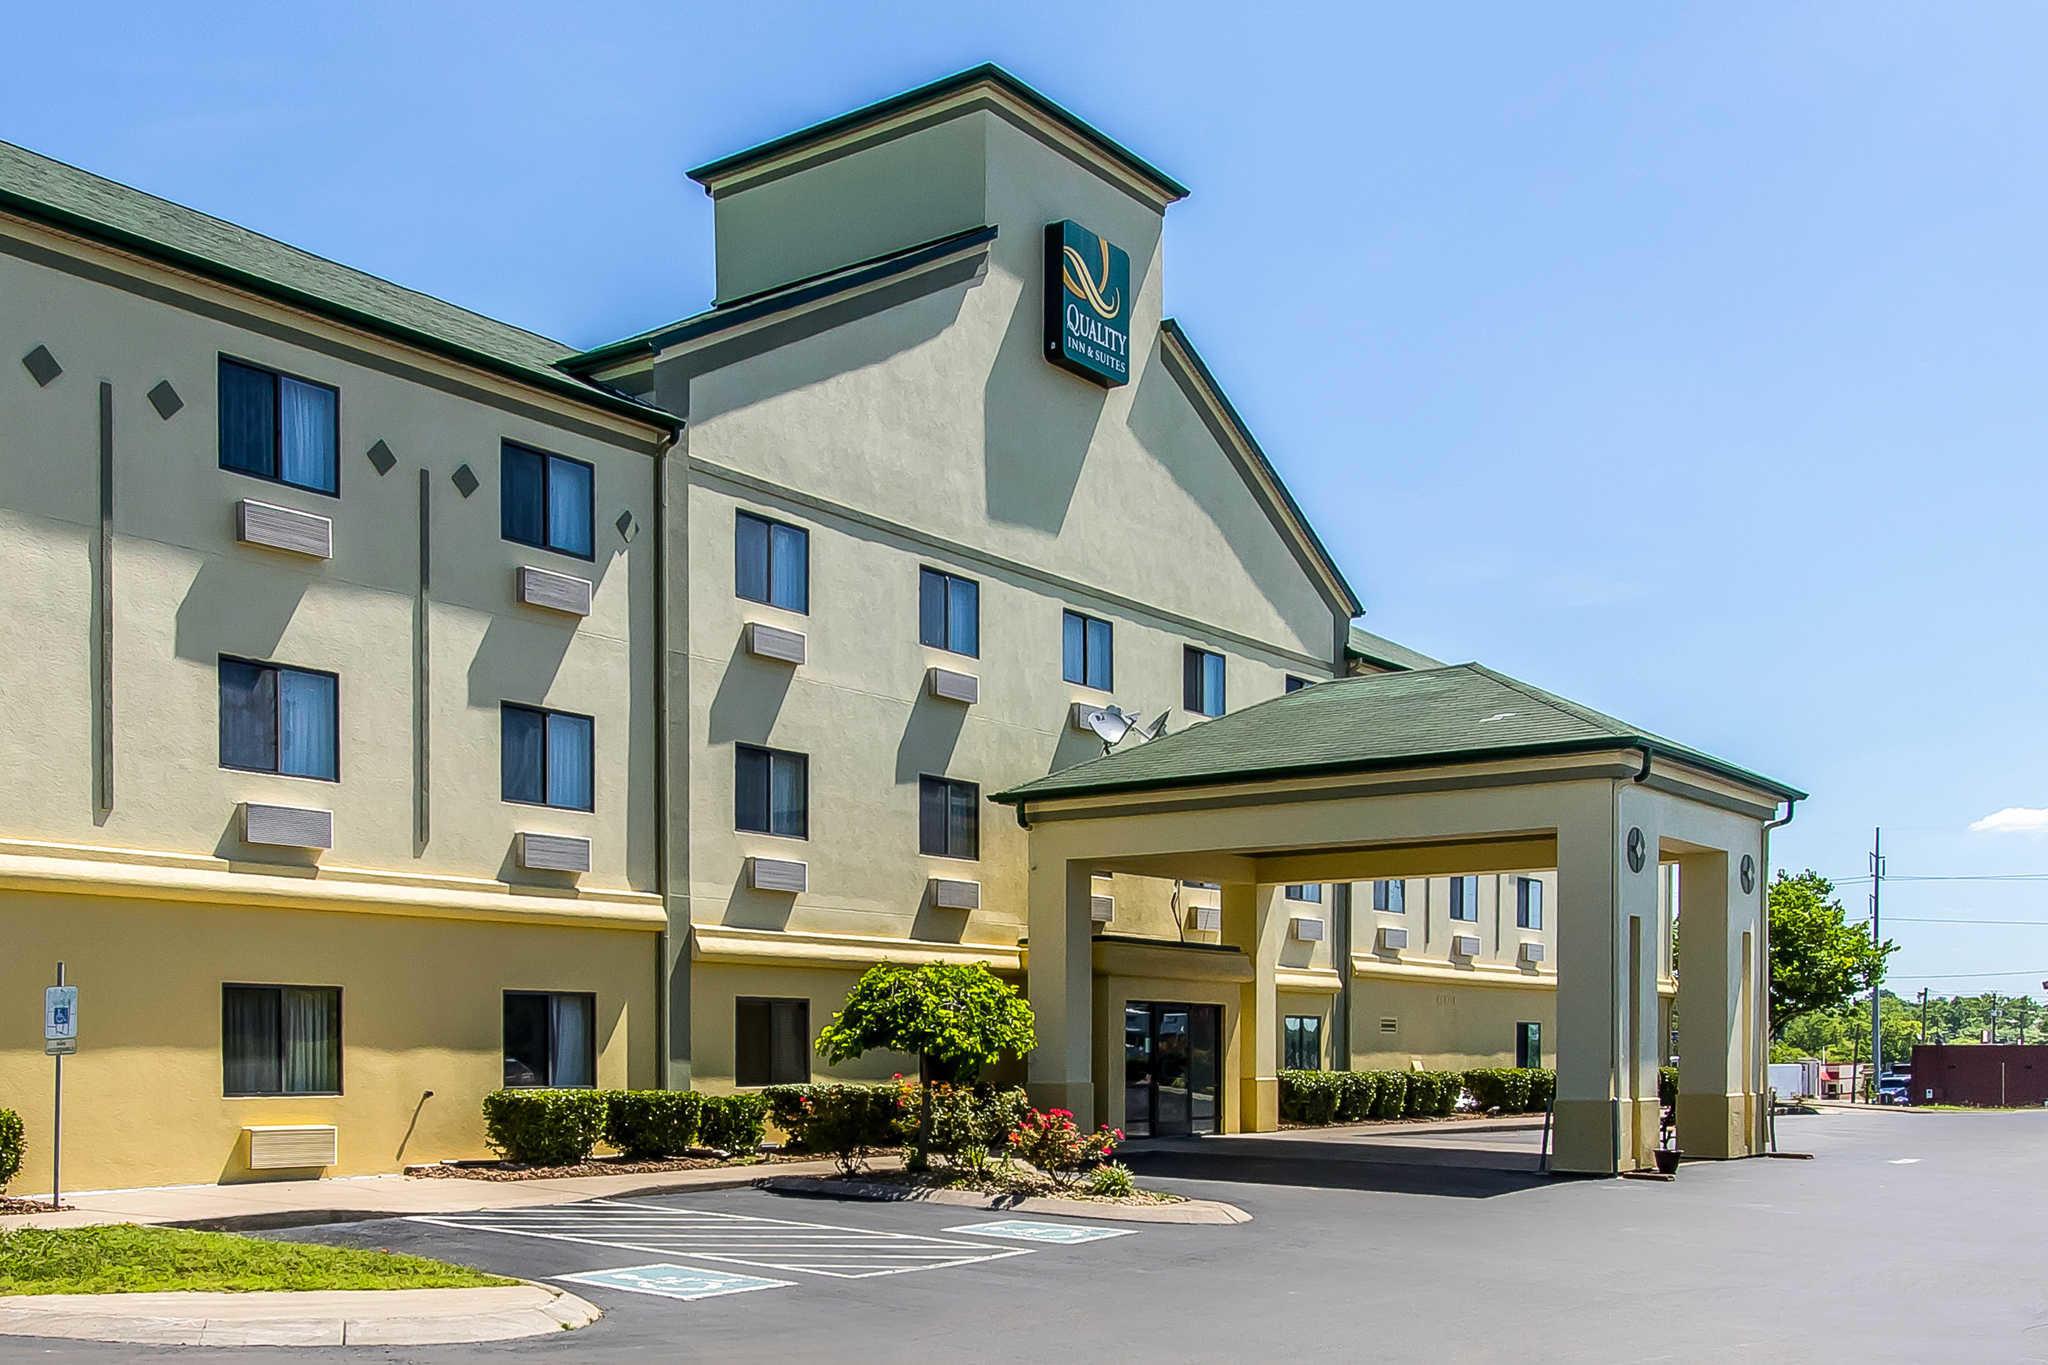 Personals in la vergne tn Roommates Listings in La Vergne, TN, Oodle Classifieds